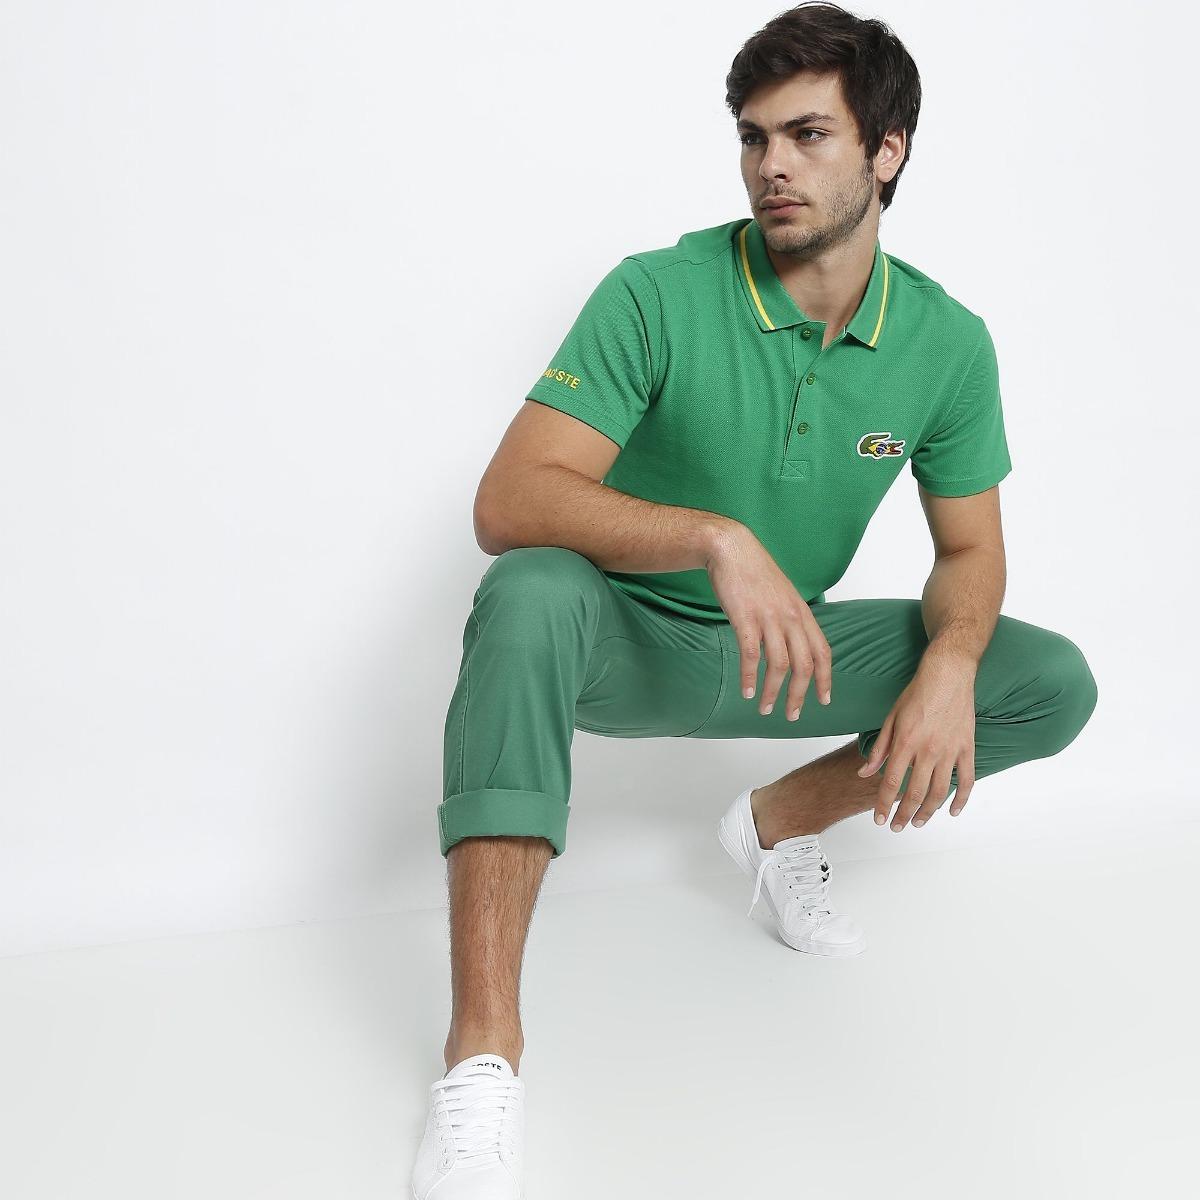 dad6f614b07 camisa masculina polo lacoste sport bandeira do brasil. Carregando zoom.